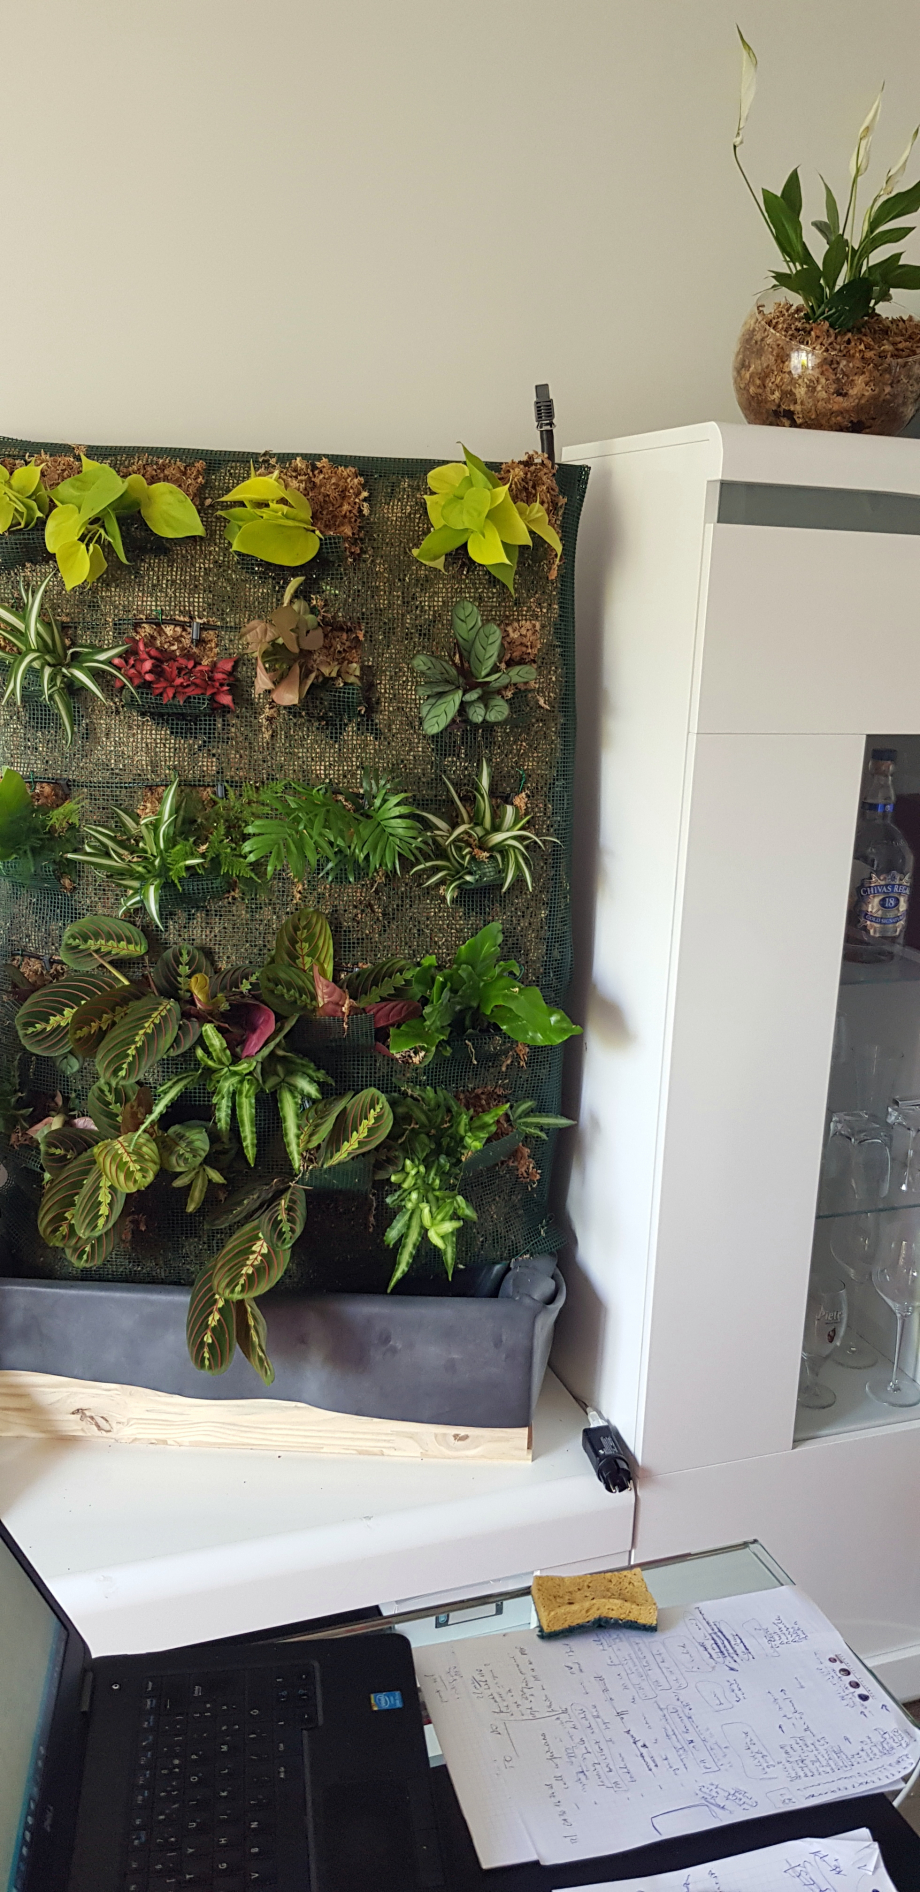 Plants 2è mur intérieur installés 11 mai 18.jpg